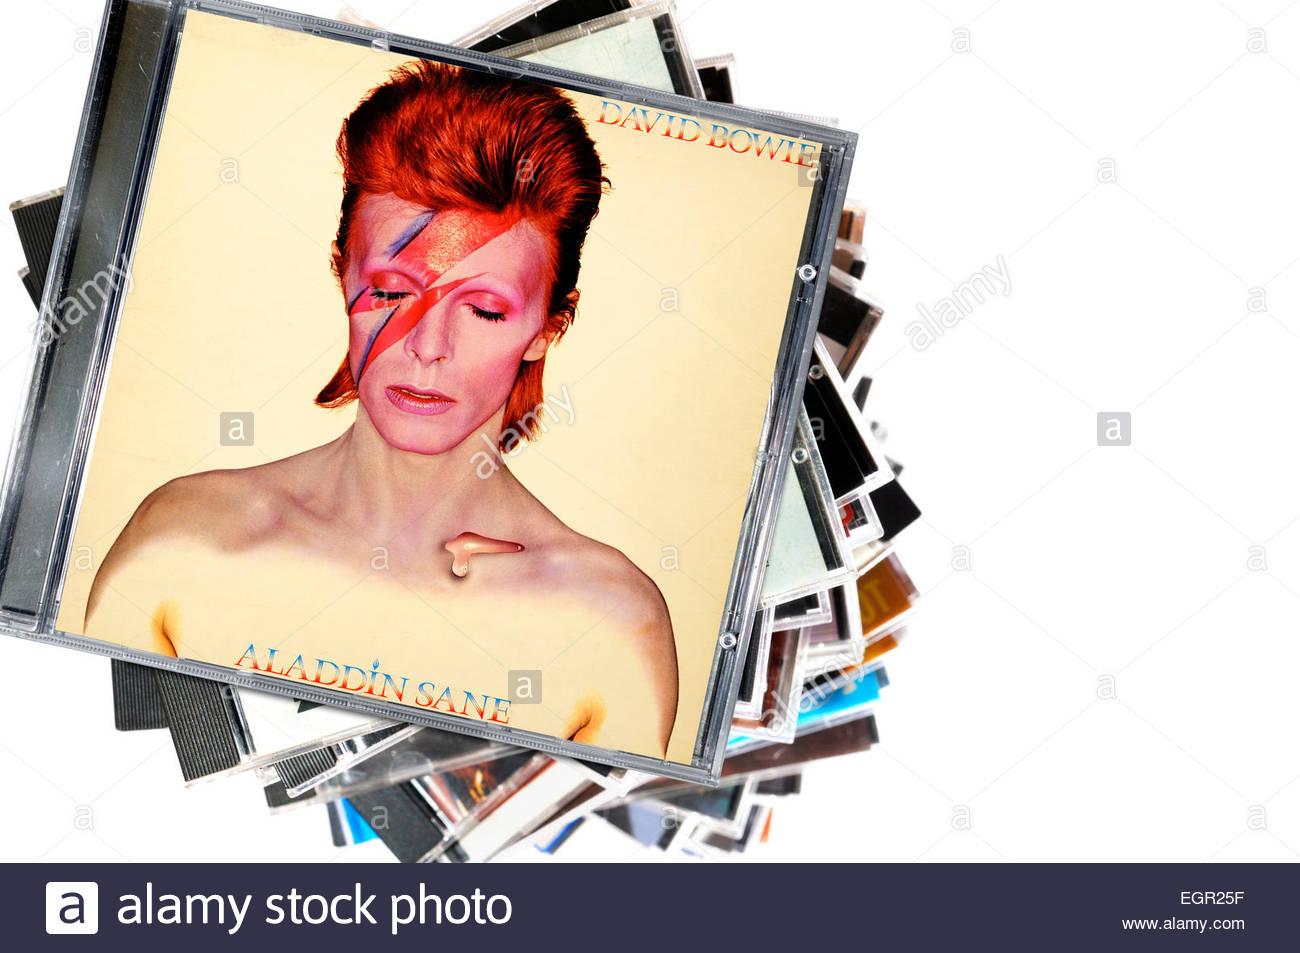 David Bowie Album Aladdin Sane, CD cases, England Stock Photo ...